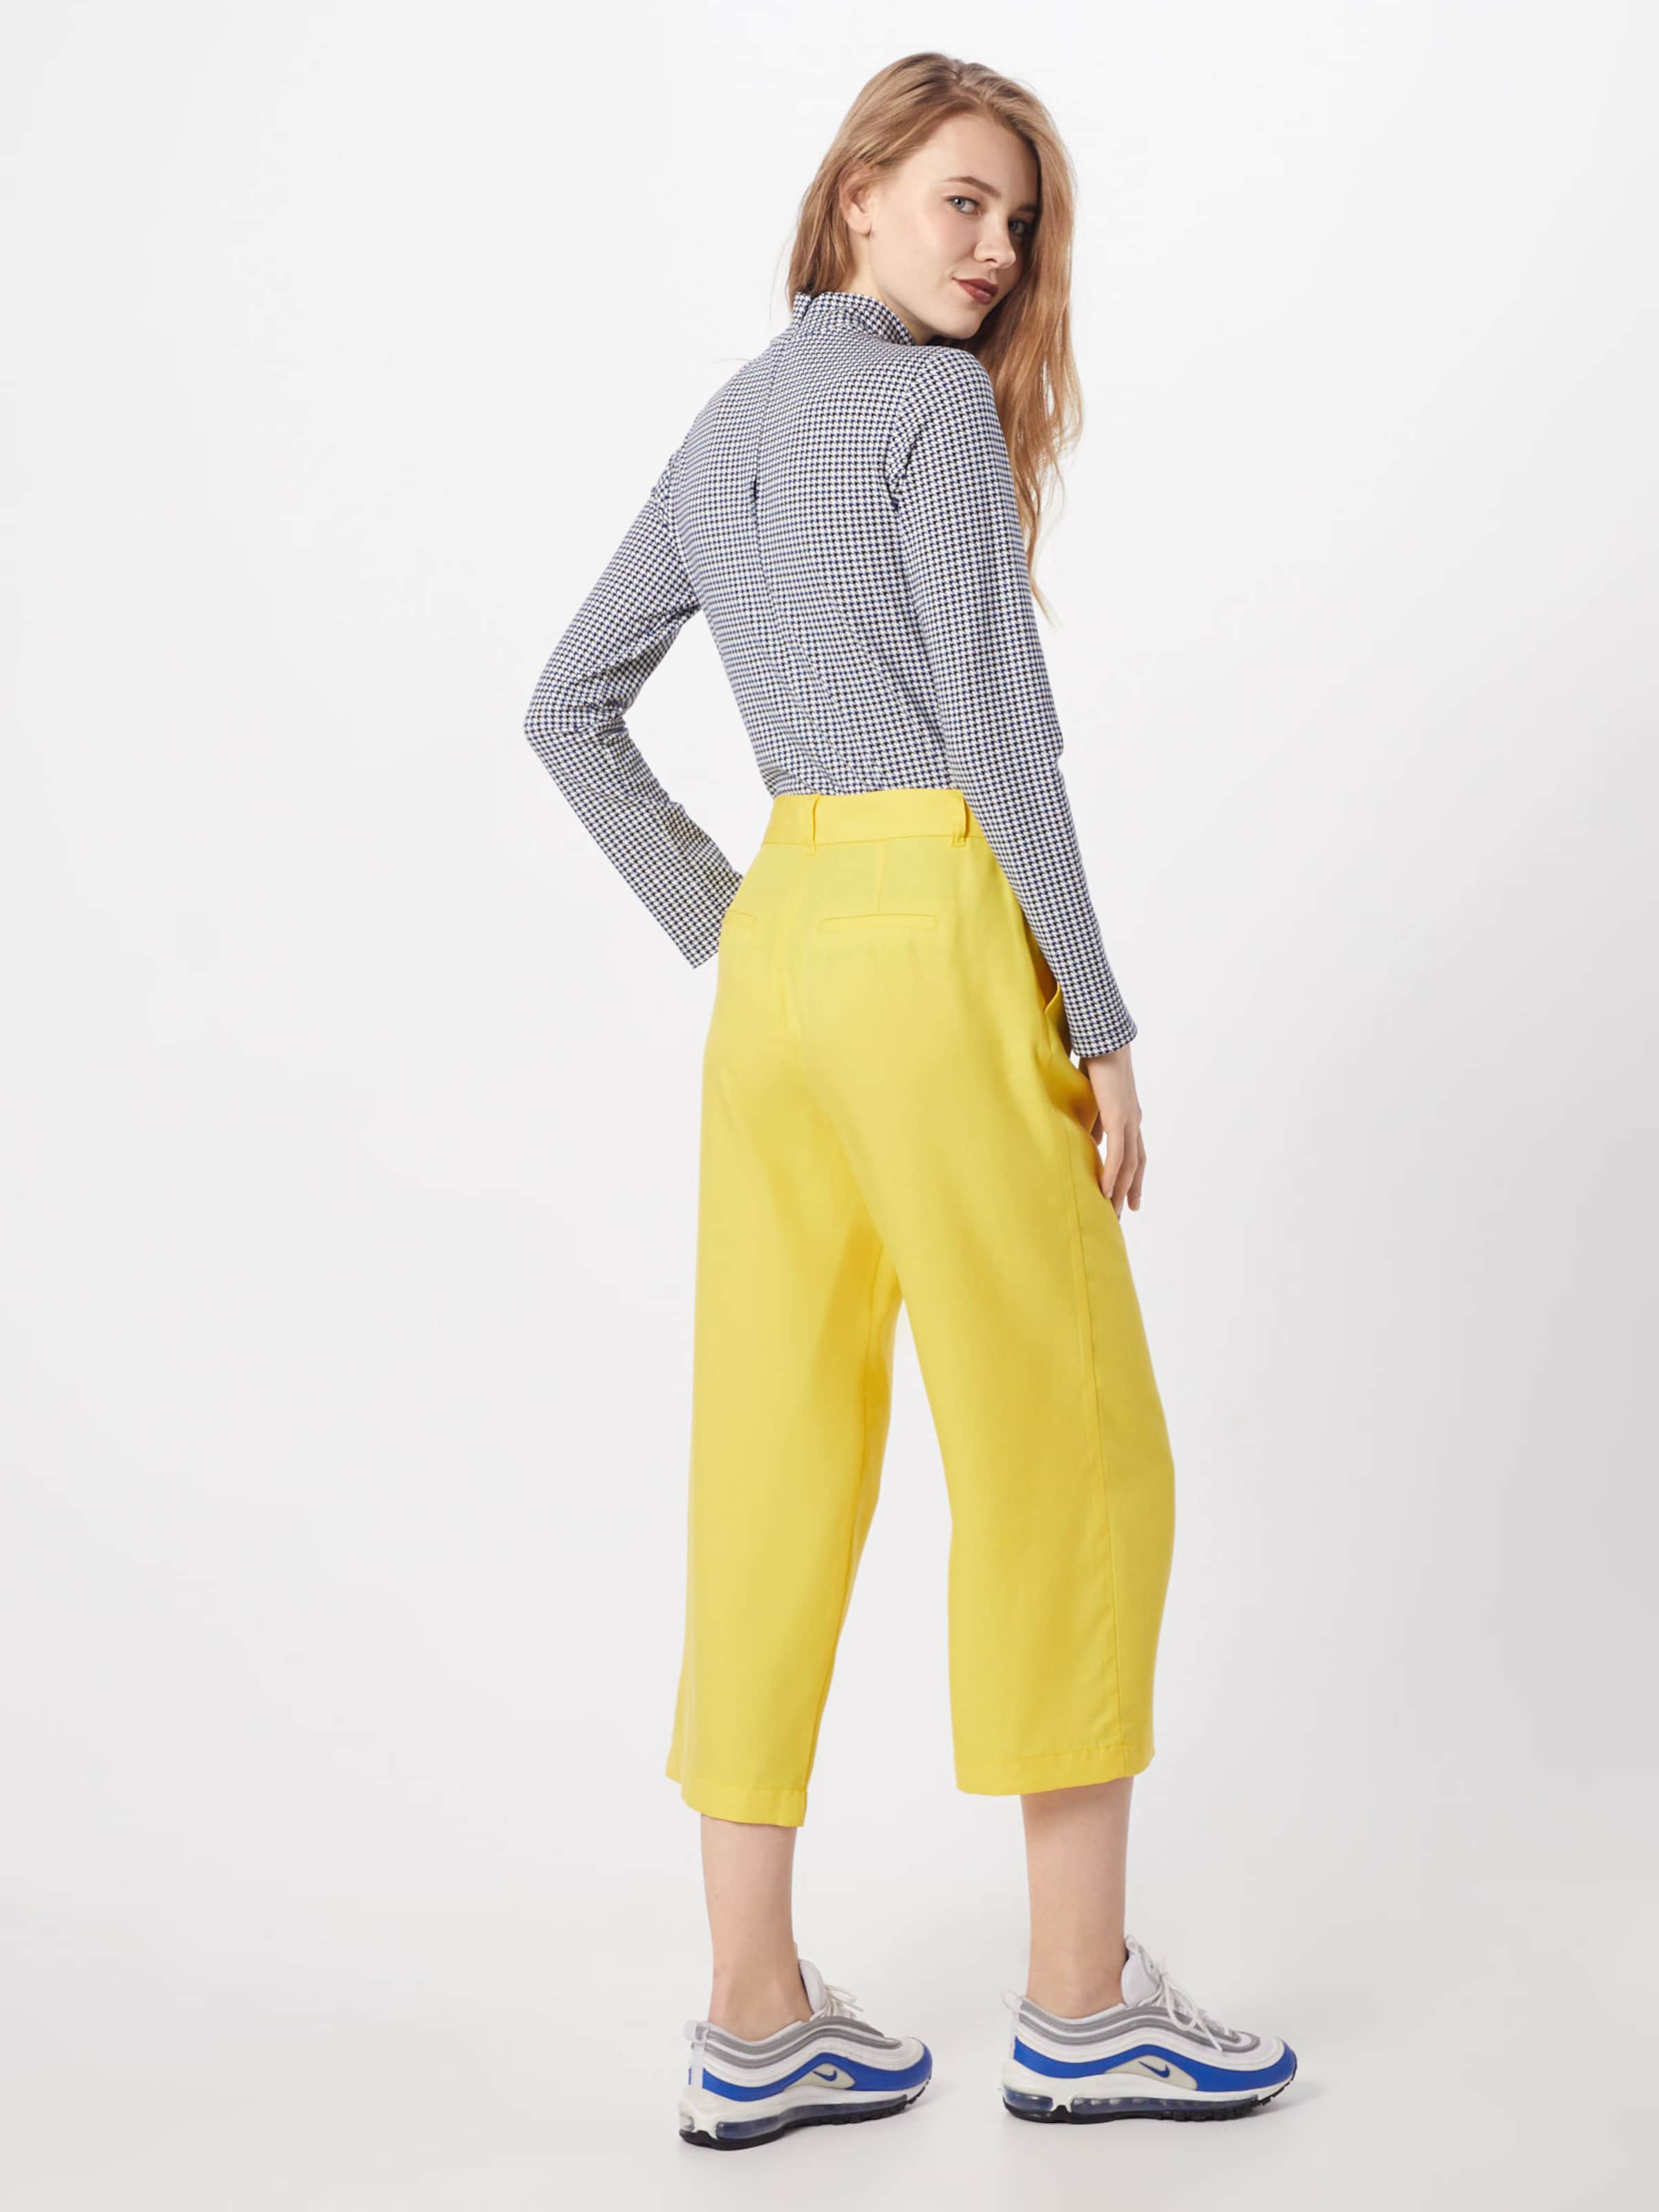 Jaune Pantalon S En Red Label oliver rBhQCxstd